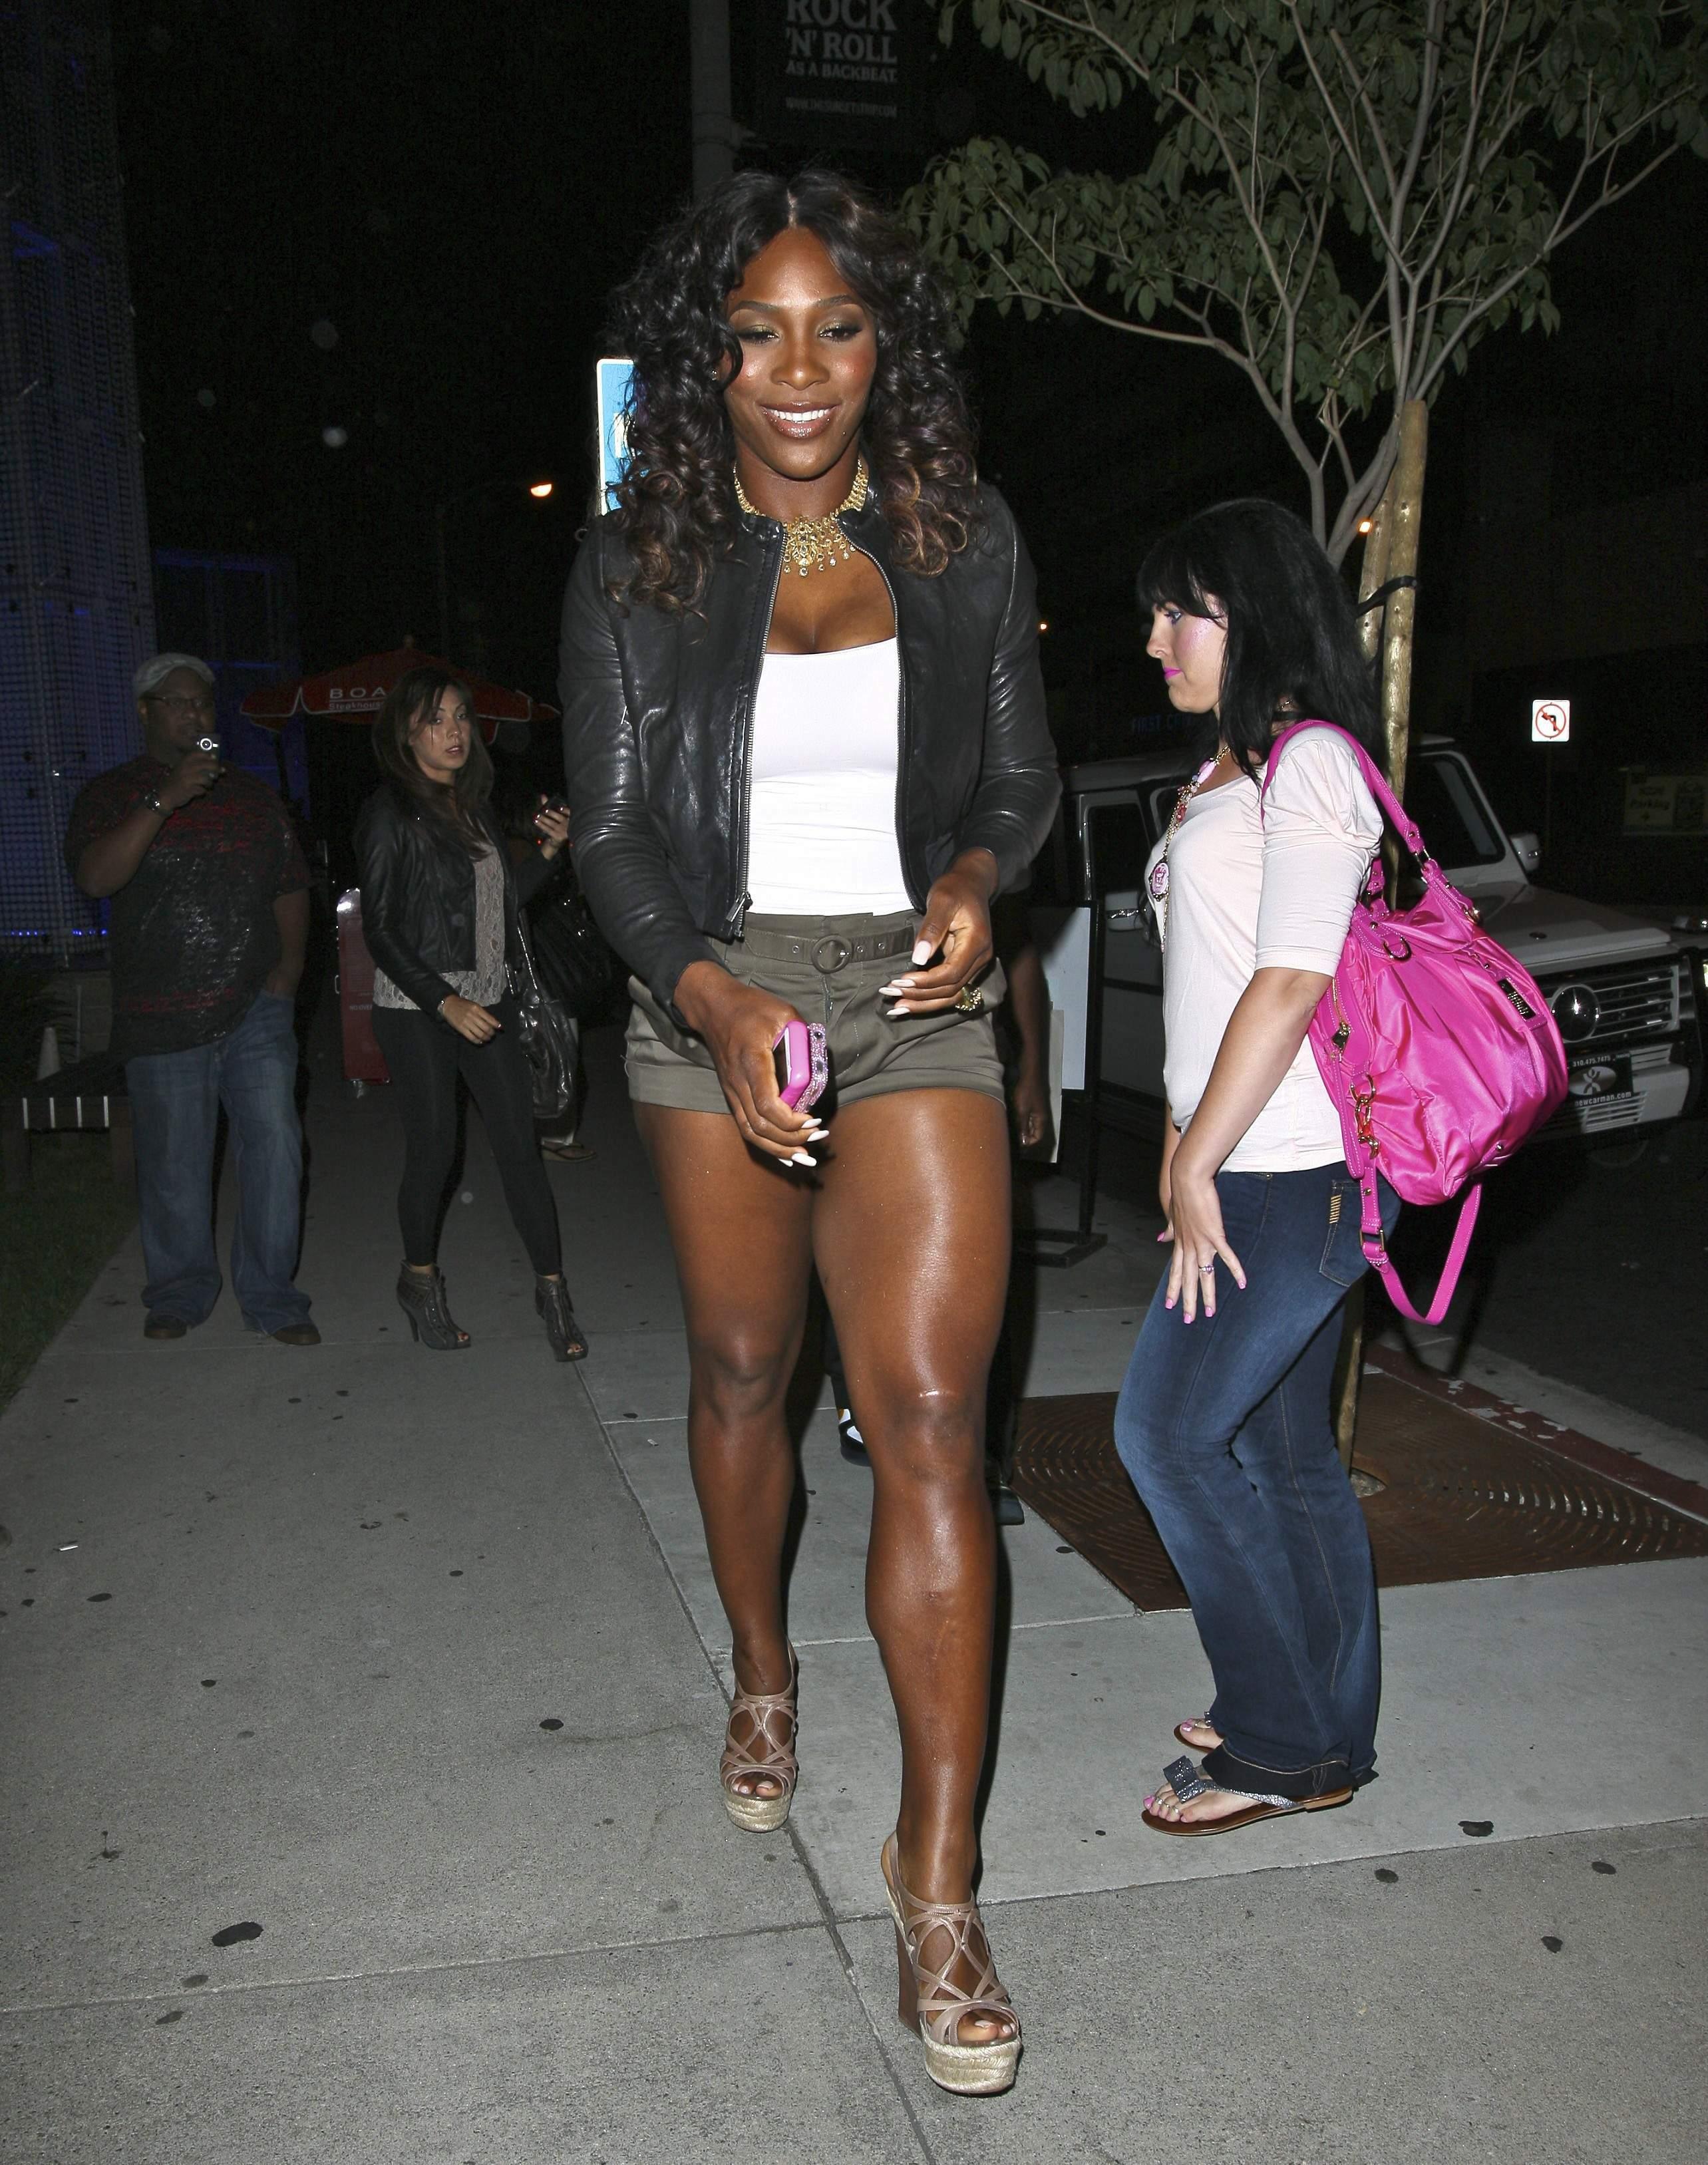 Serena Williams BoaSteakhouseJuly13201115_123_107lo.jpg